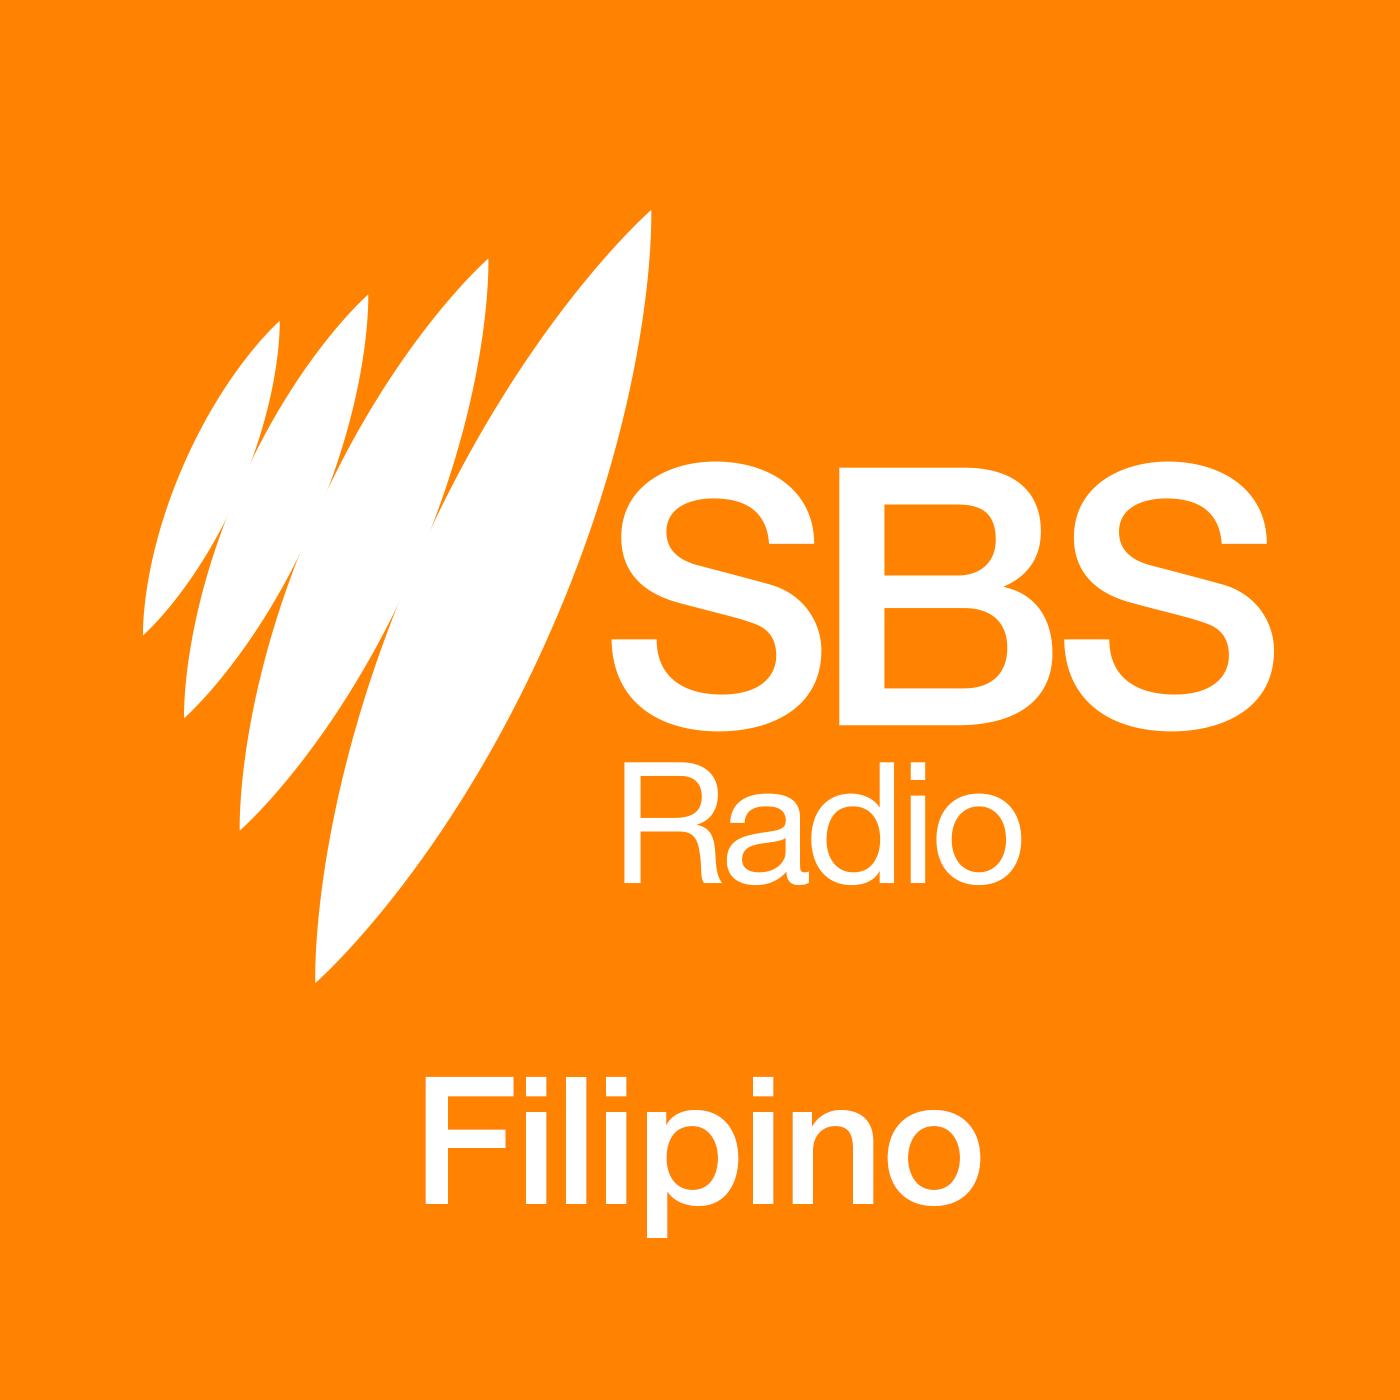 <![CDATA[Filipino]]>